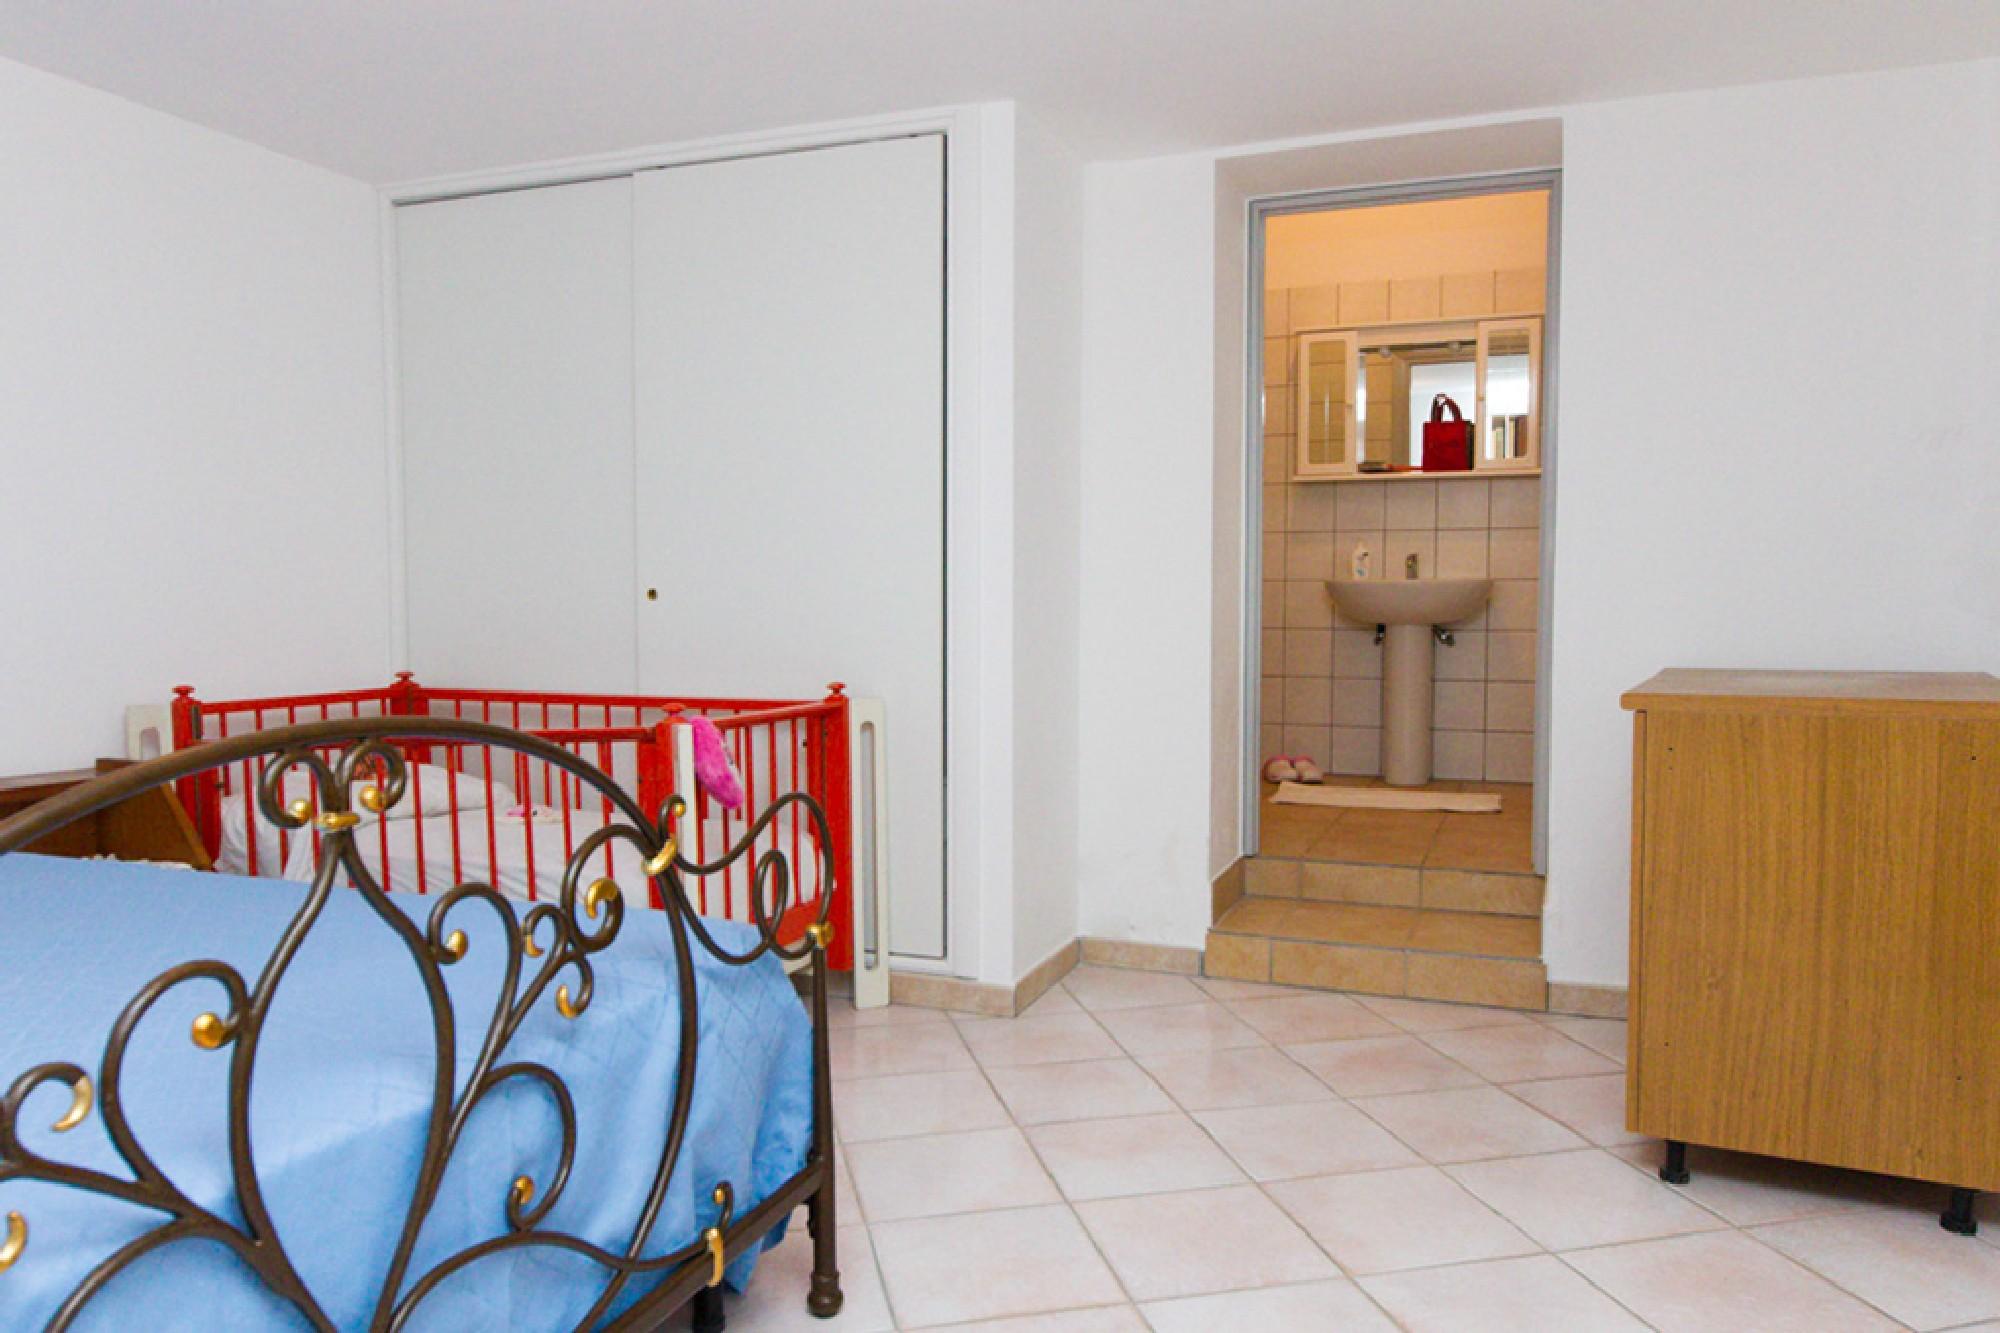 Apartment Apt Porticato 2 - Cantoru photo 24289668